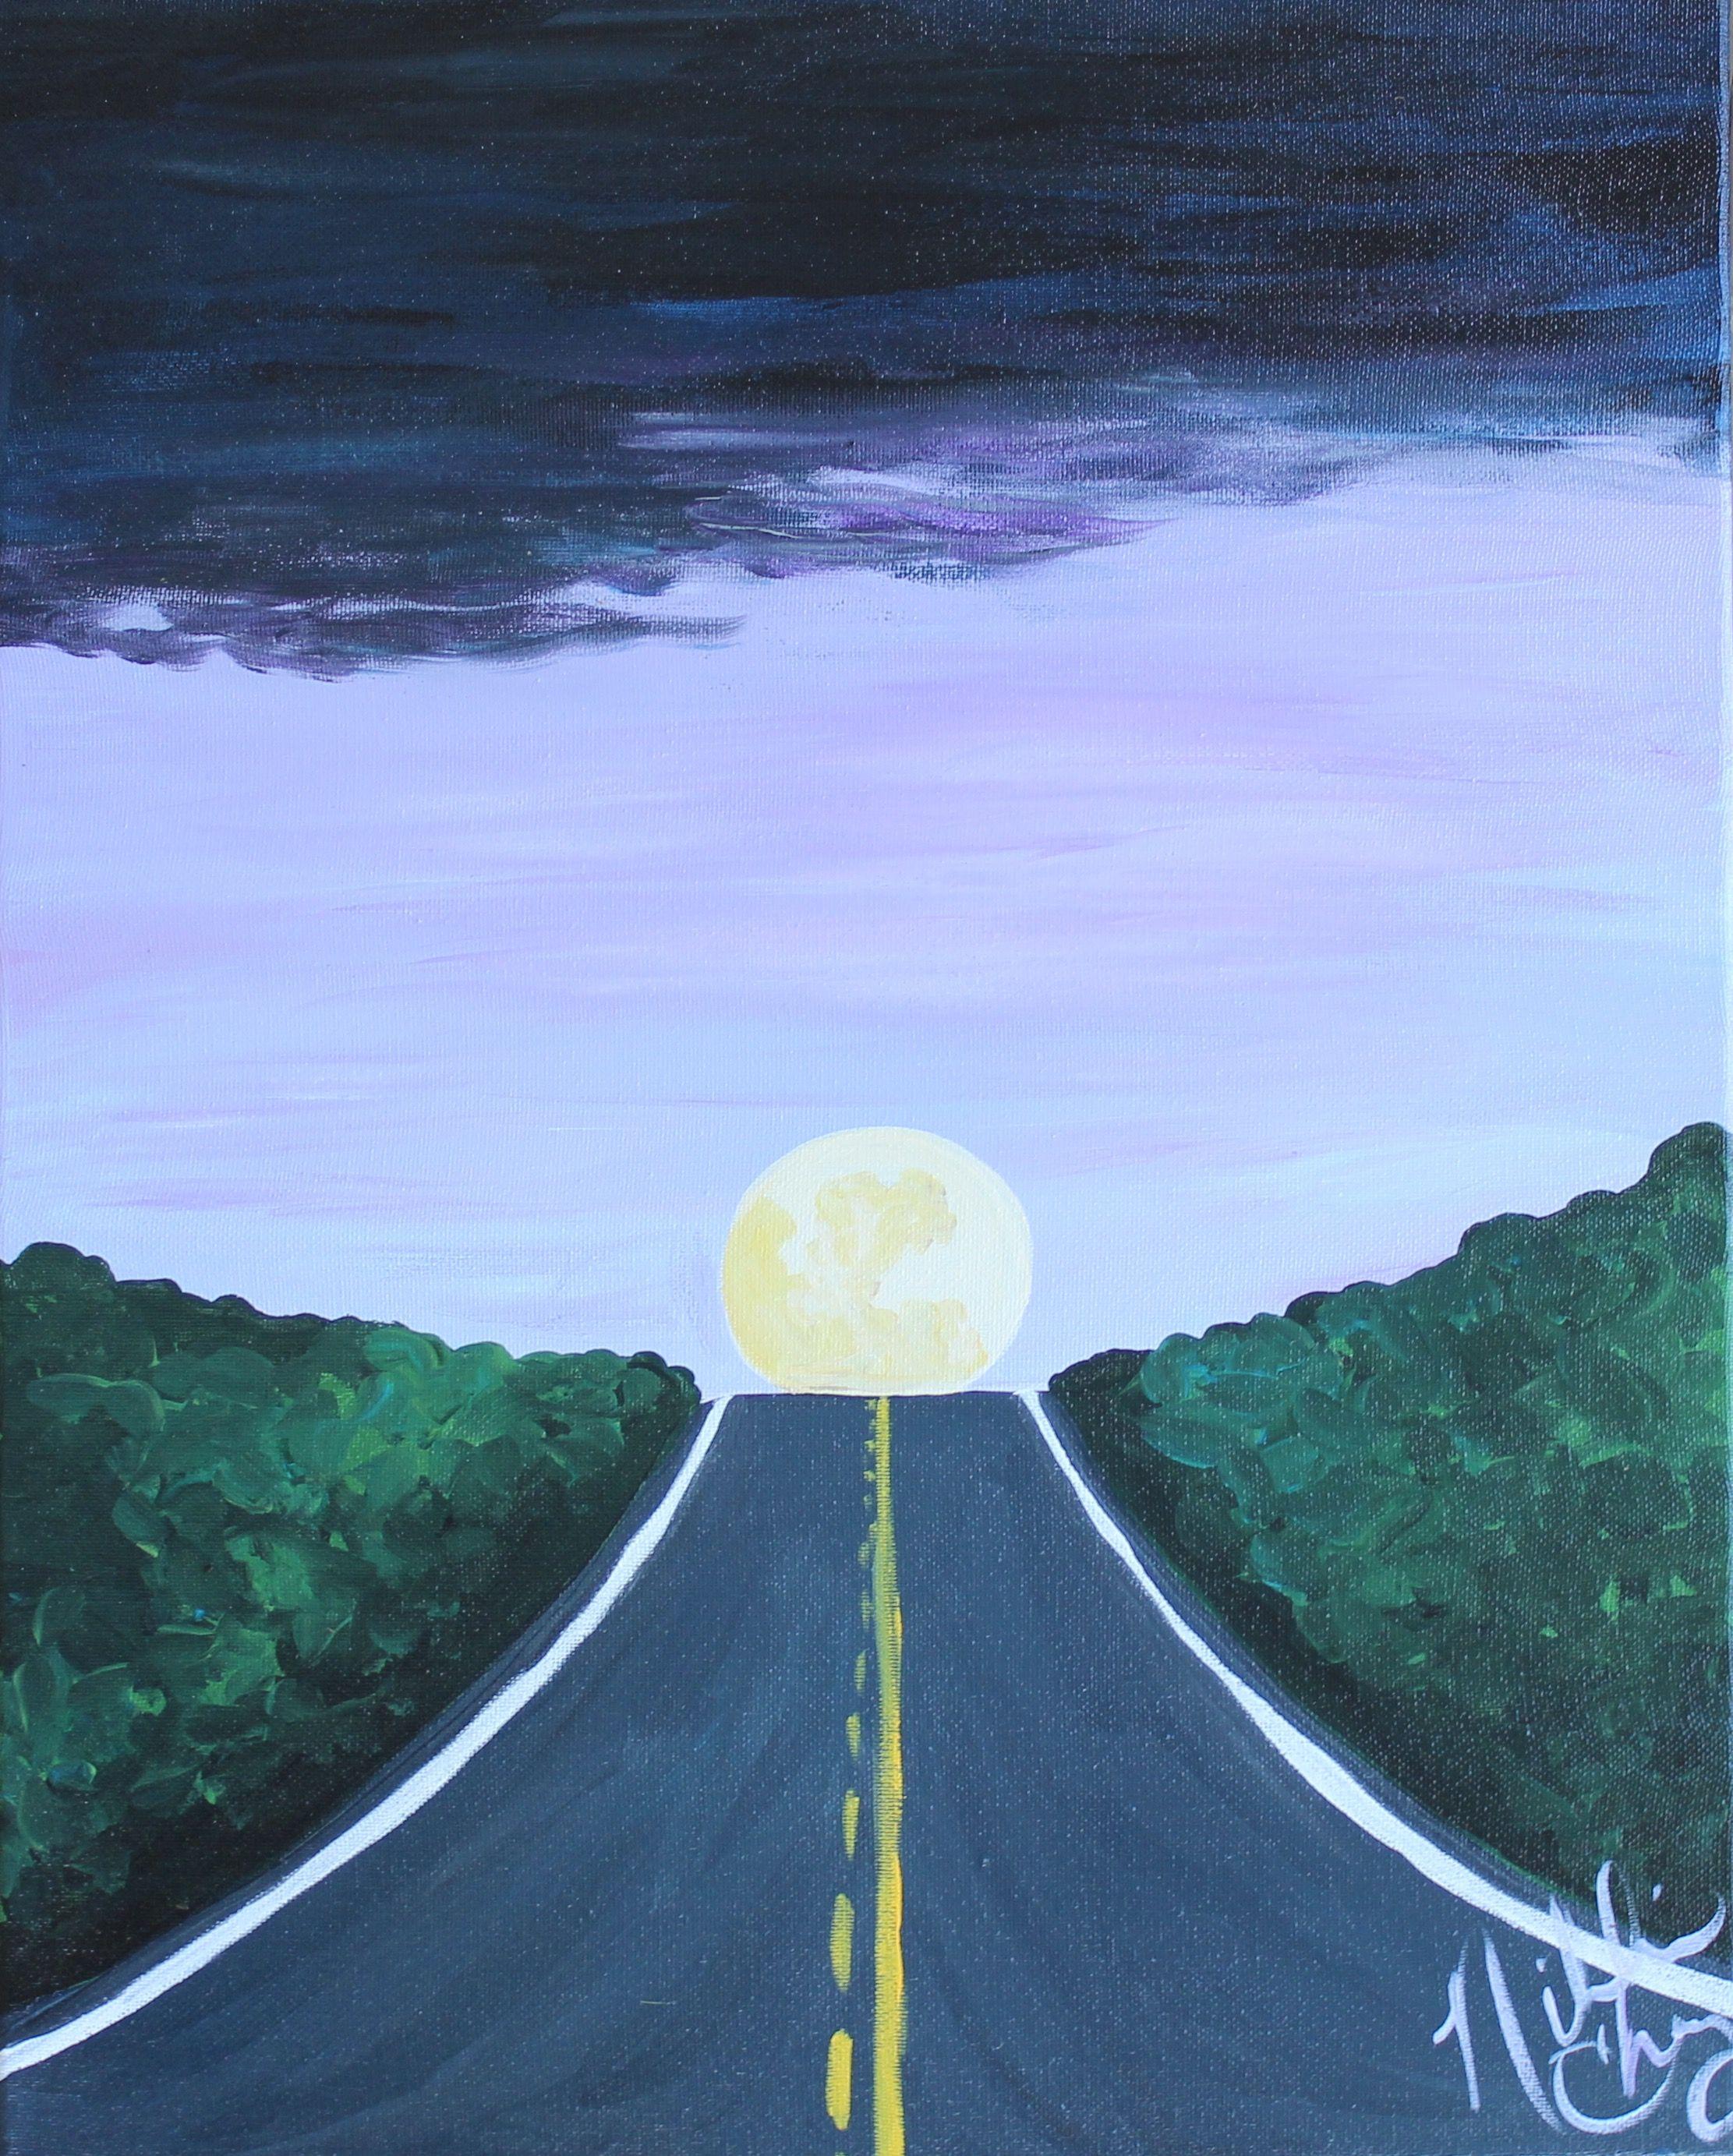 """moon over the blacktop"" by artist nikki cherry / the preppy possum   #moon #moonlight #thepreppypossum #preppypossum #nikkicherry #ncart"